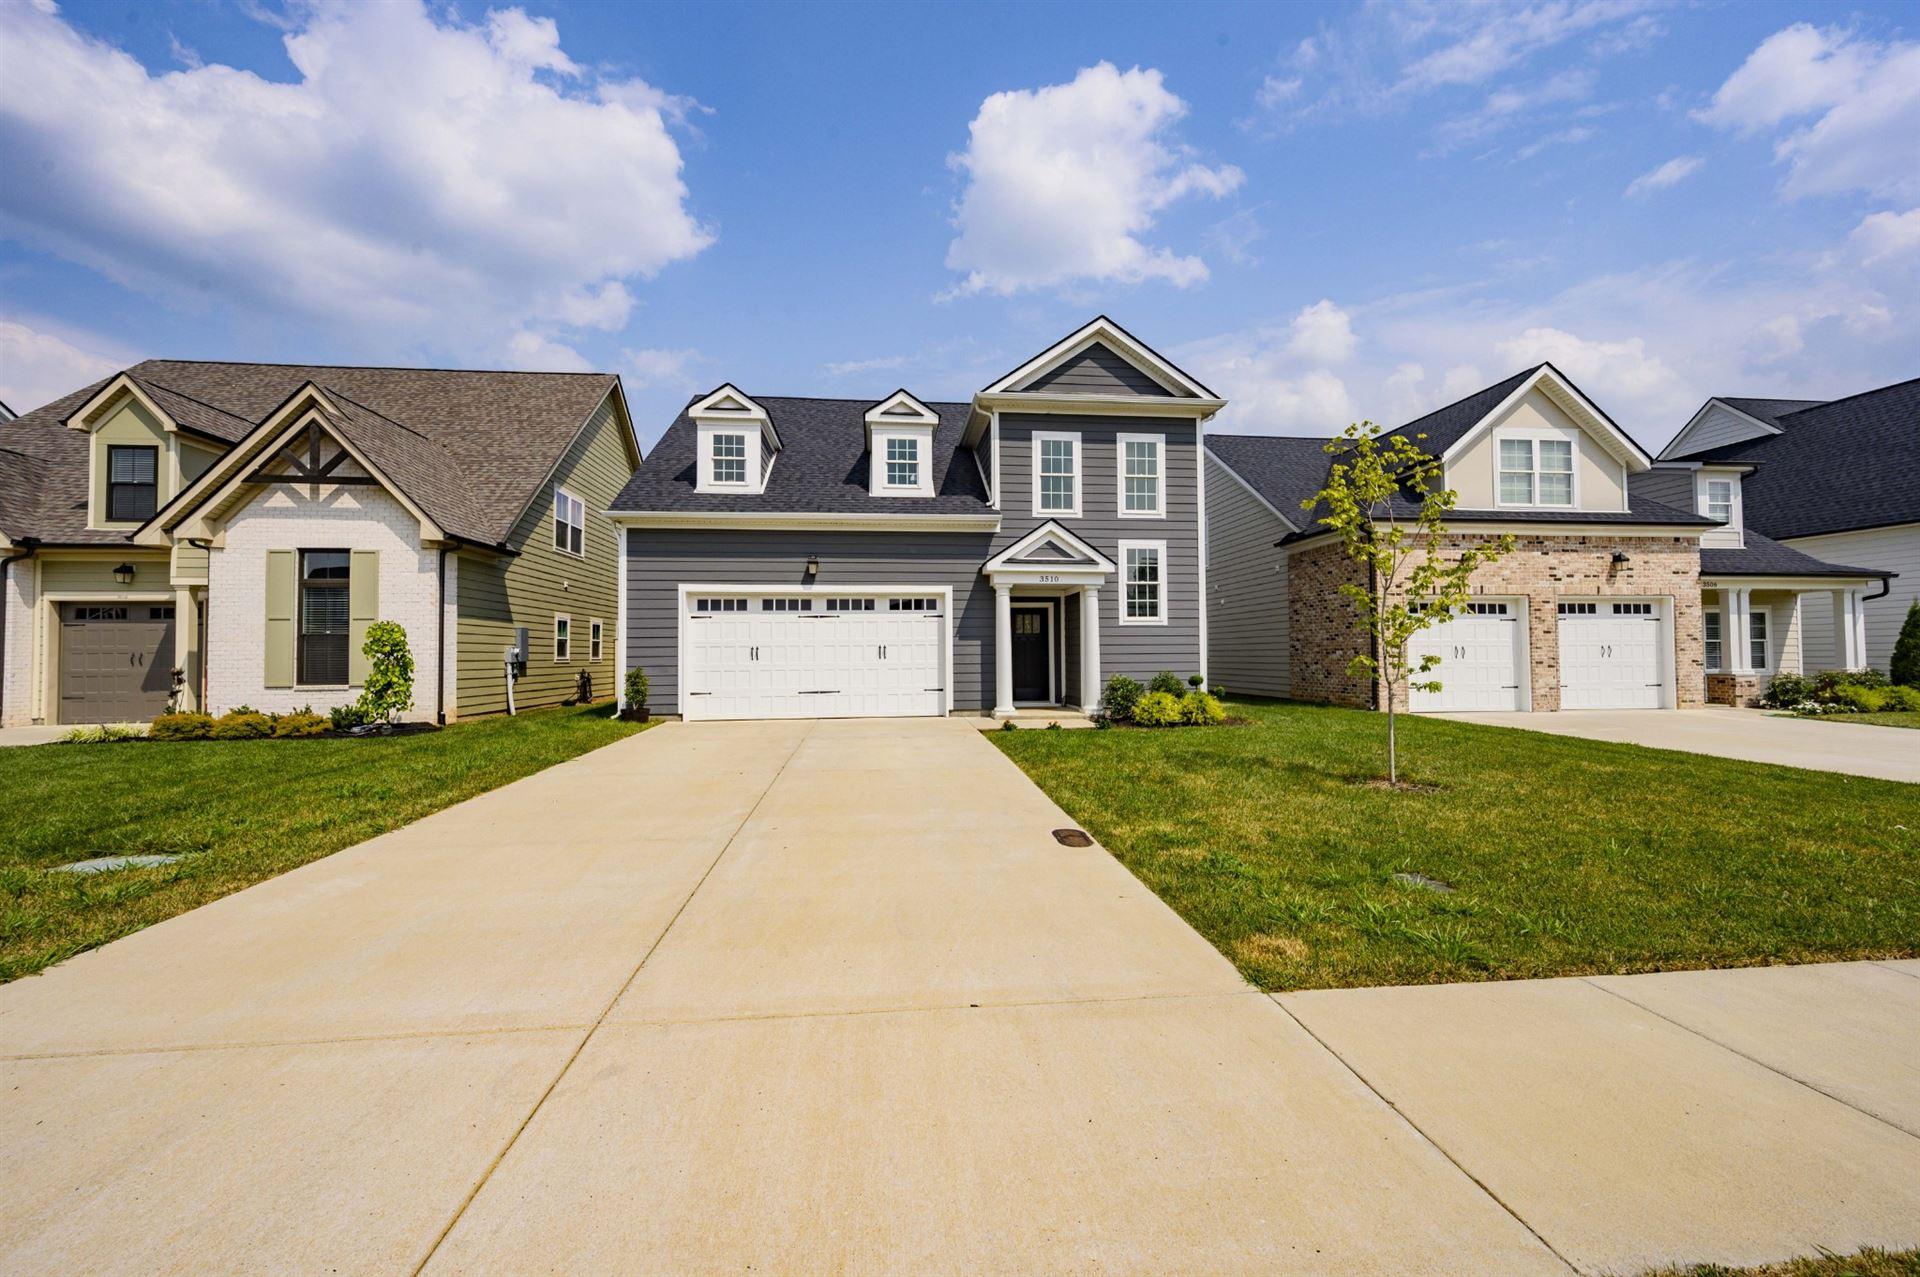 3510 Caroline Farms Dr, Murfreesboro, TN 37129 - MLS#: 2278592